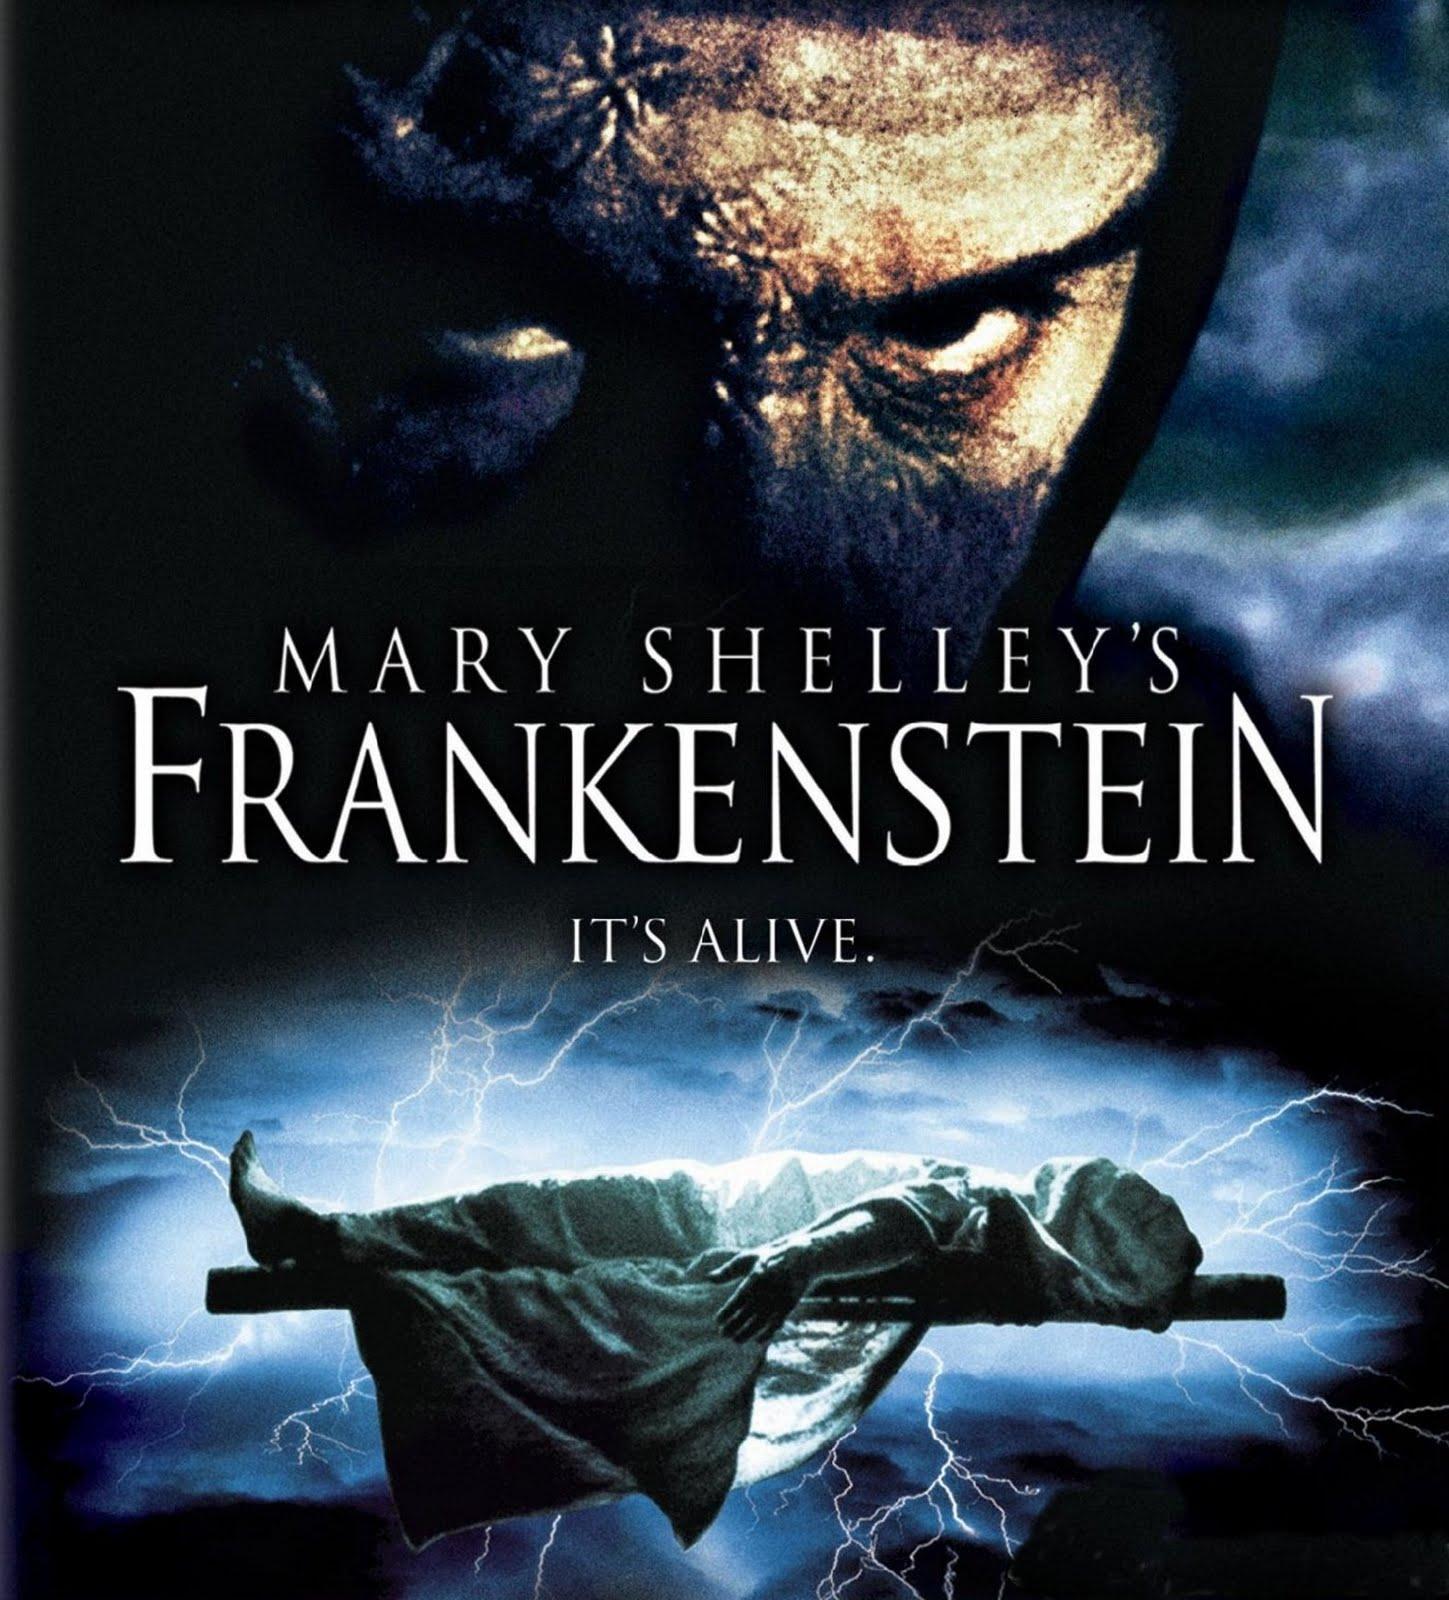 Frankenstein mary shelley audio book